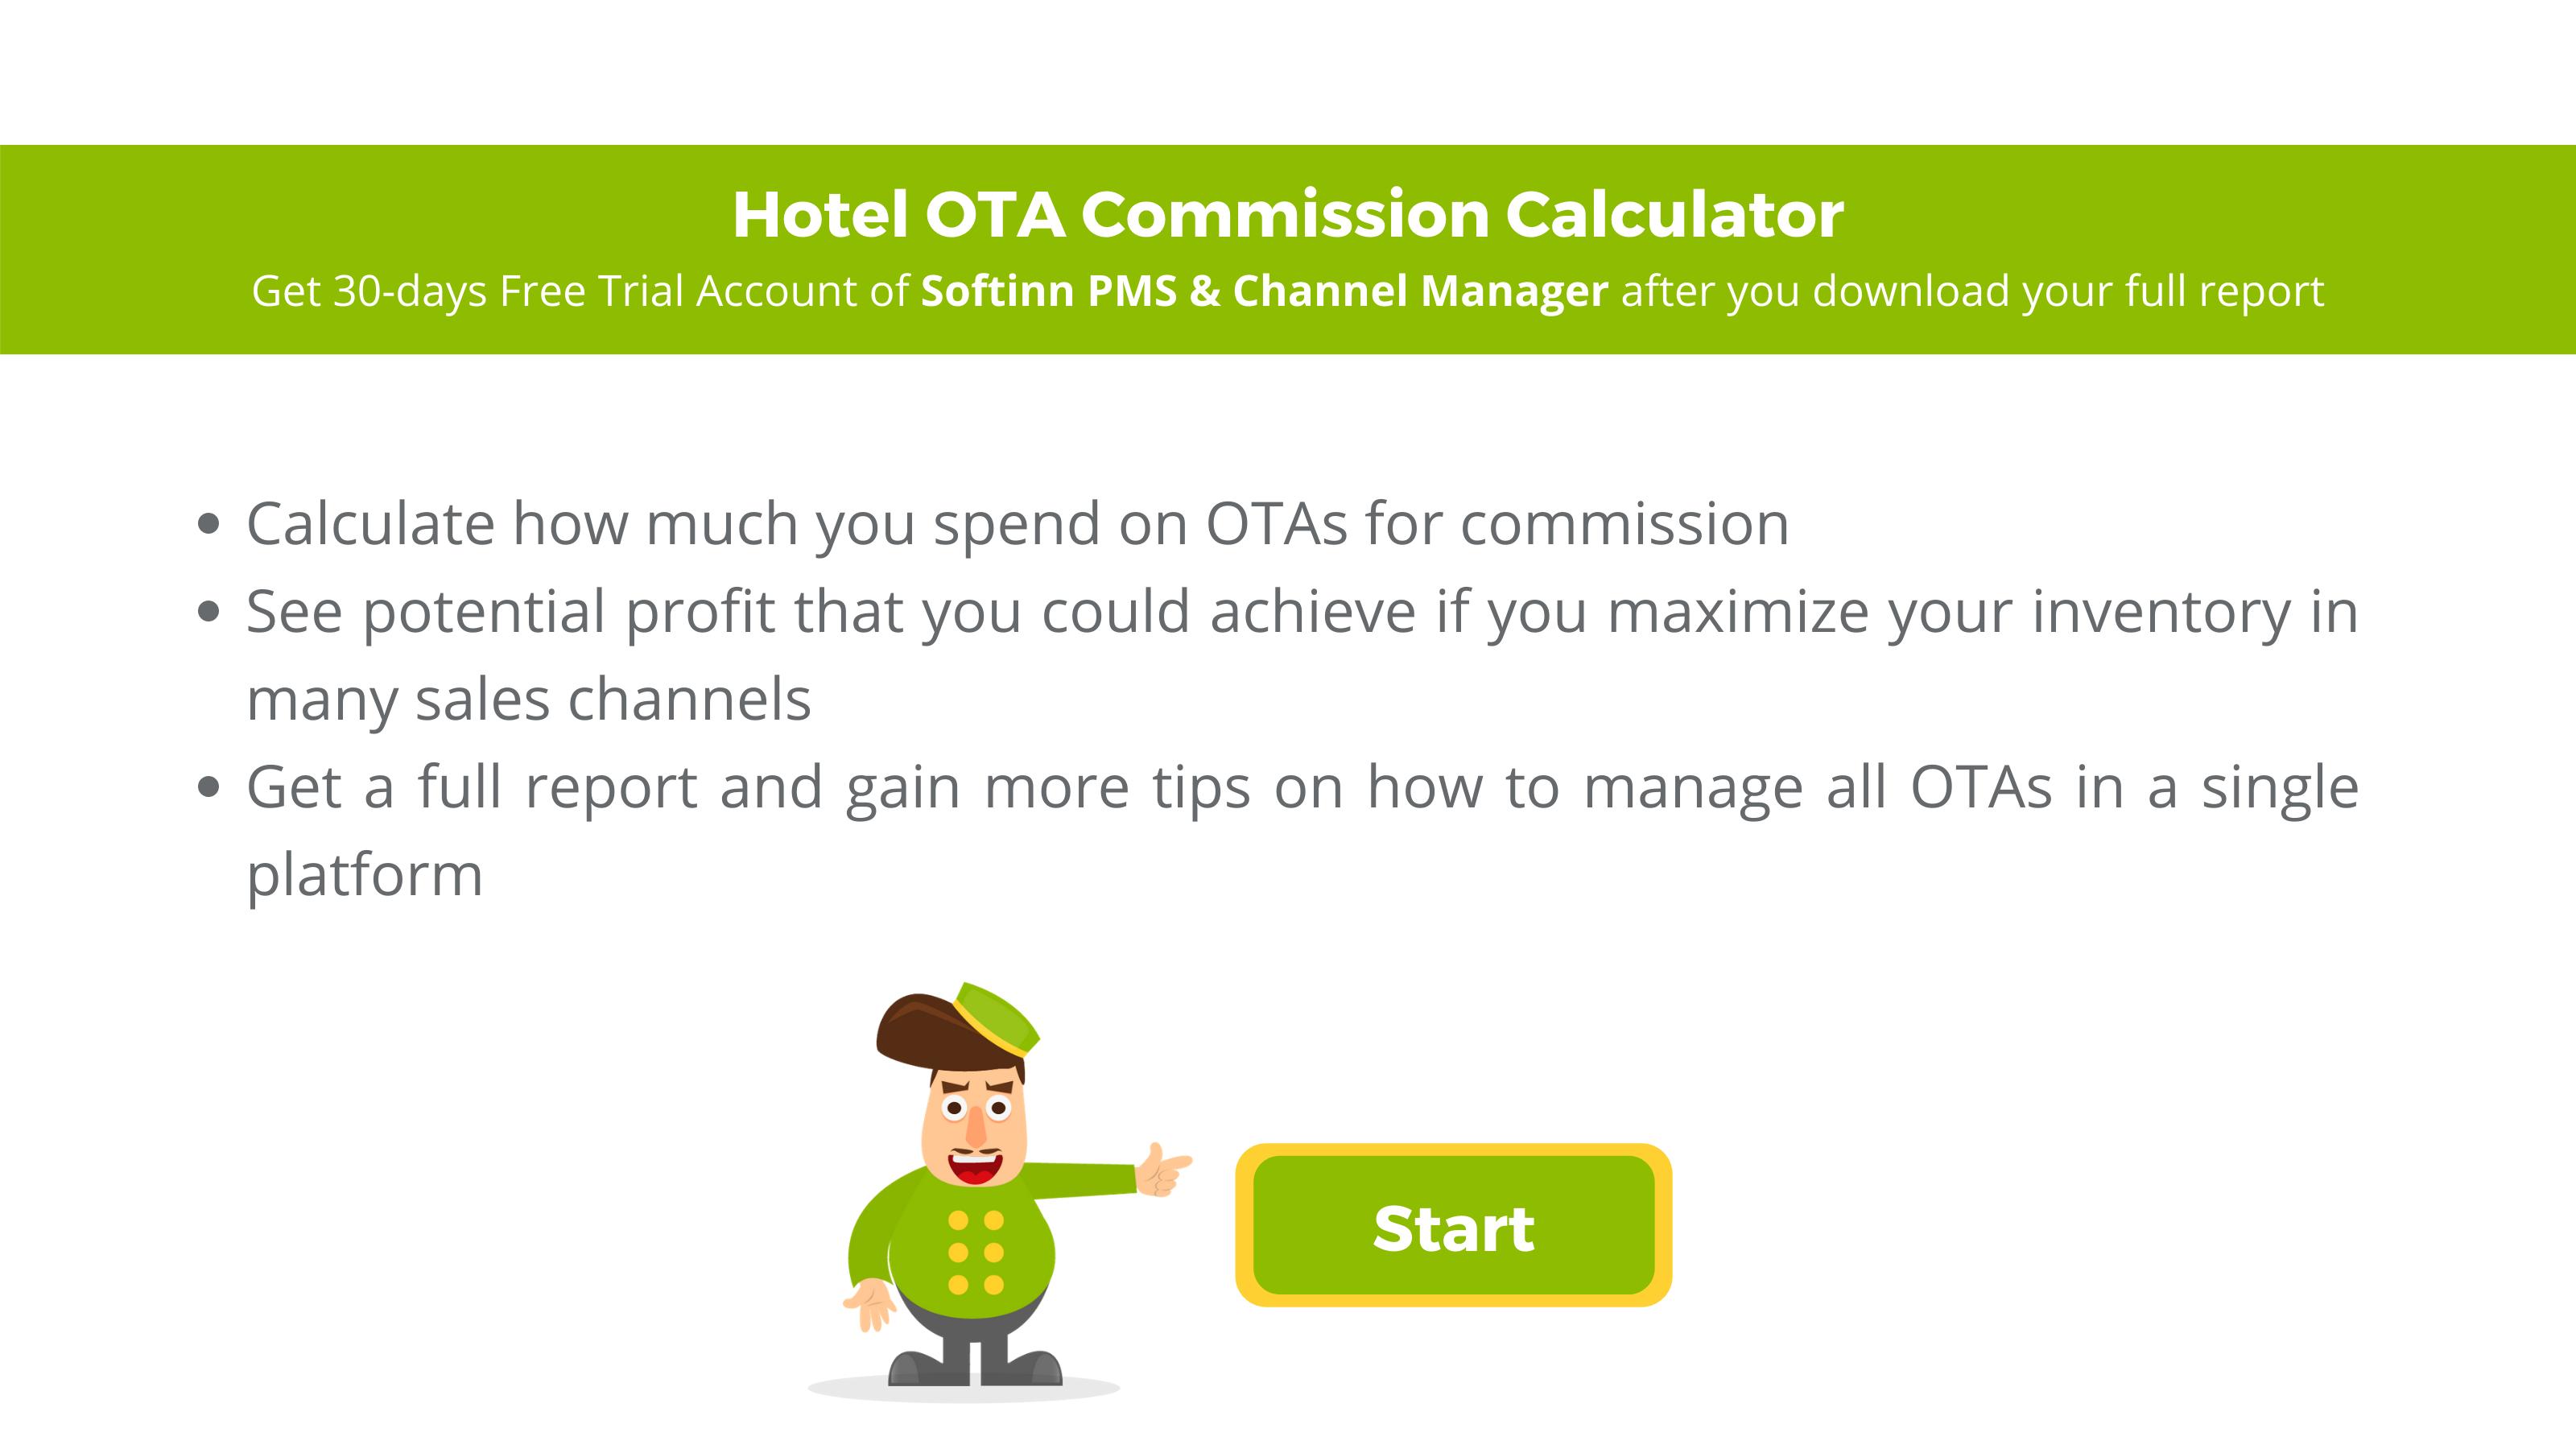 Hotel OTA Commission Calculator-1